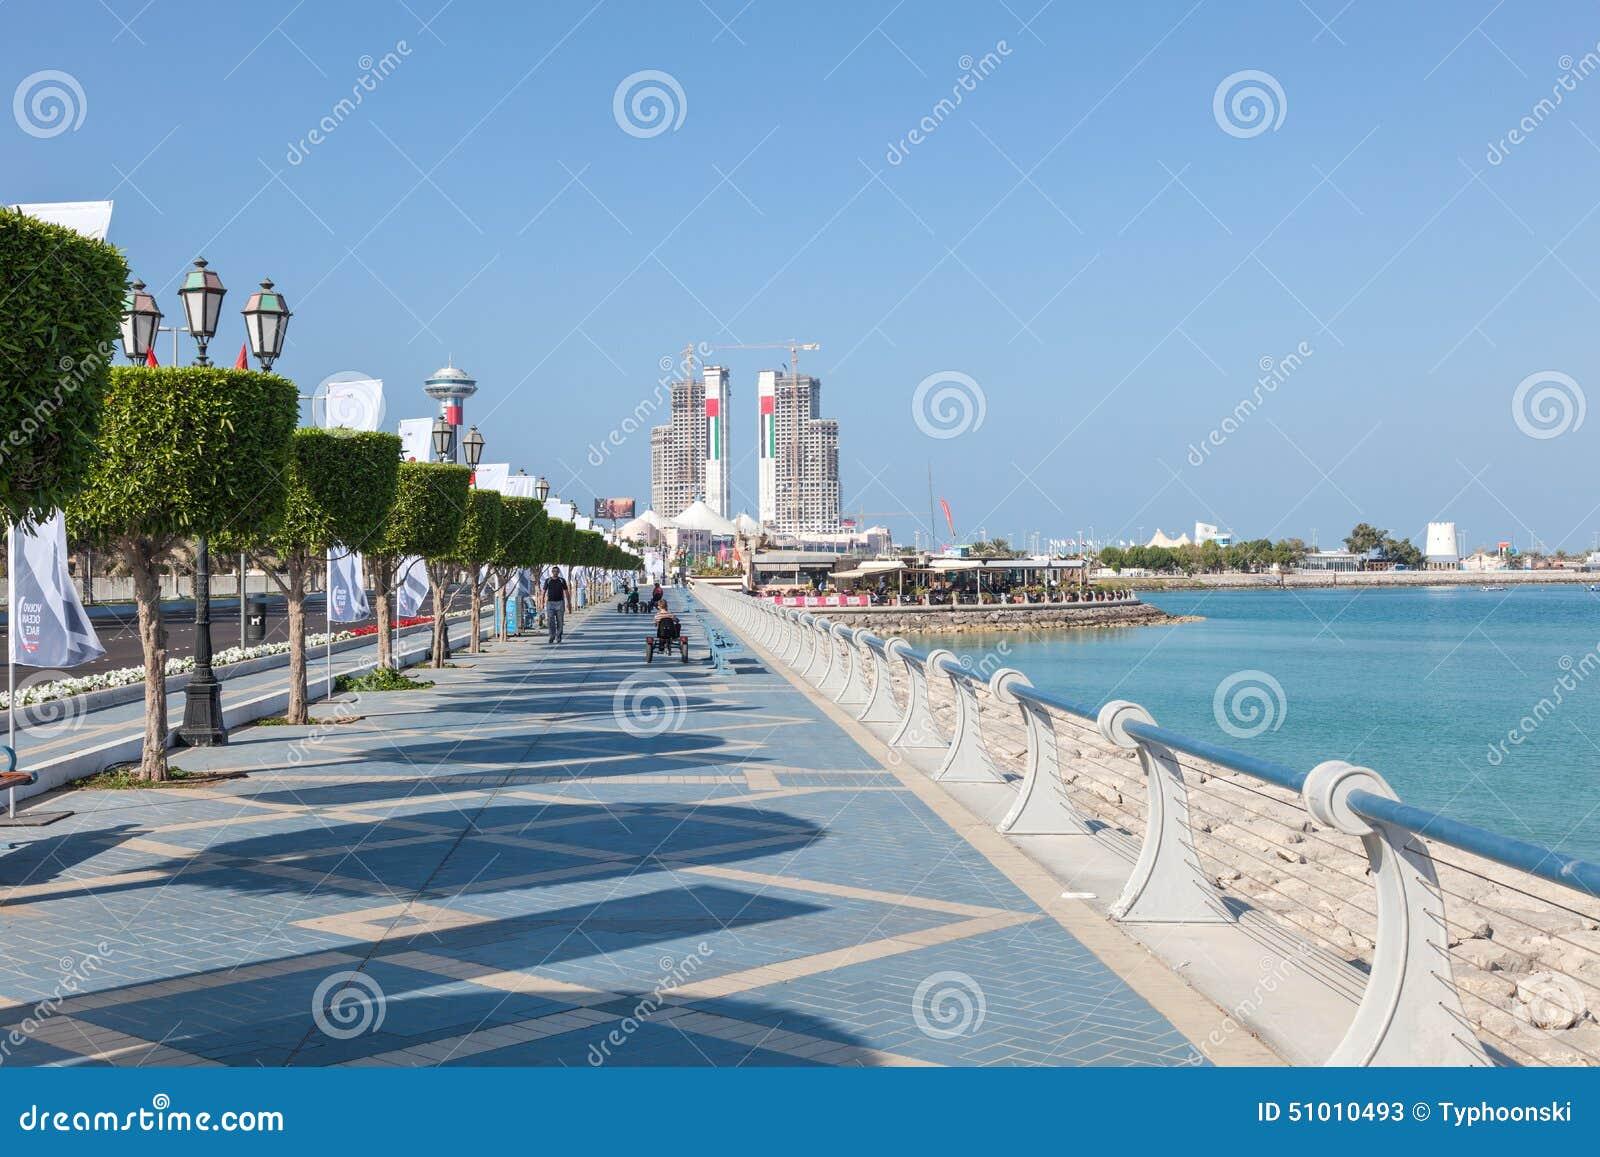 Promenade de bord de mer en abu dhabi photo stock ditorial image du jour stationnement 51010493 - Abu dhabi luoghi di interesse ...